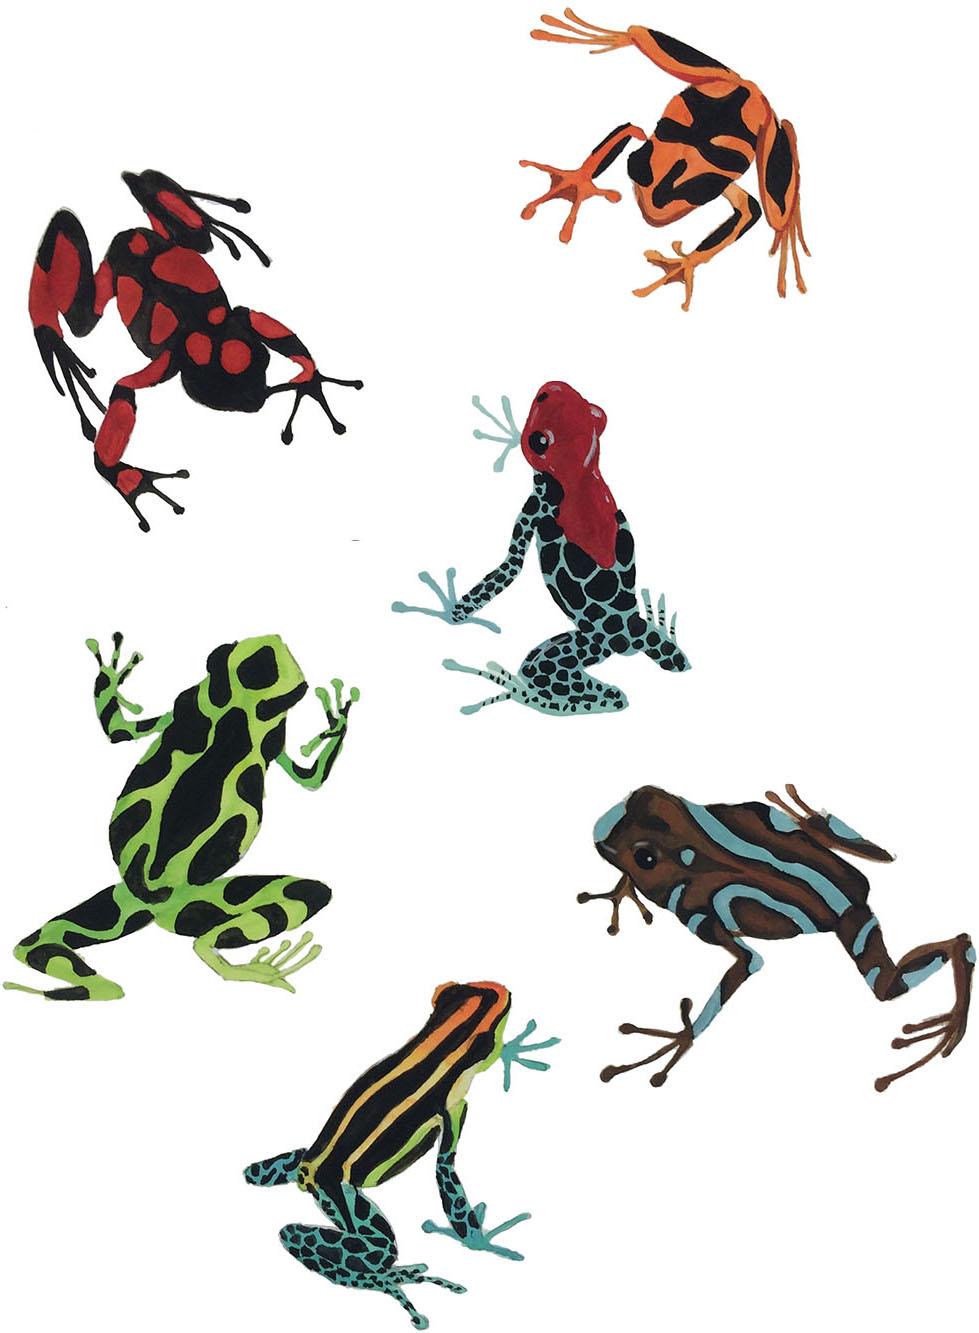 Poison dartfrogs